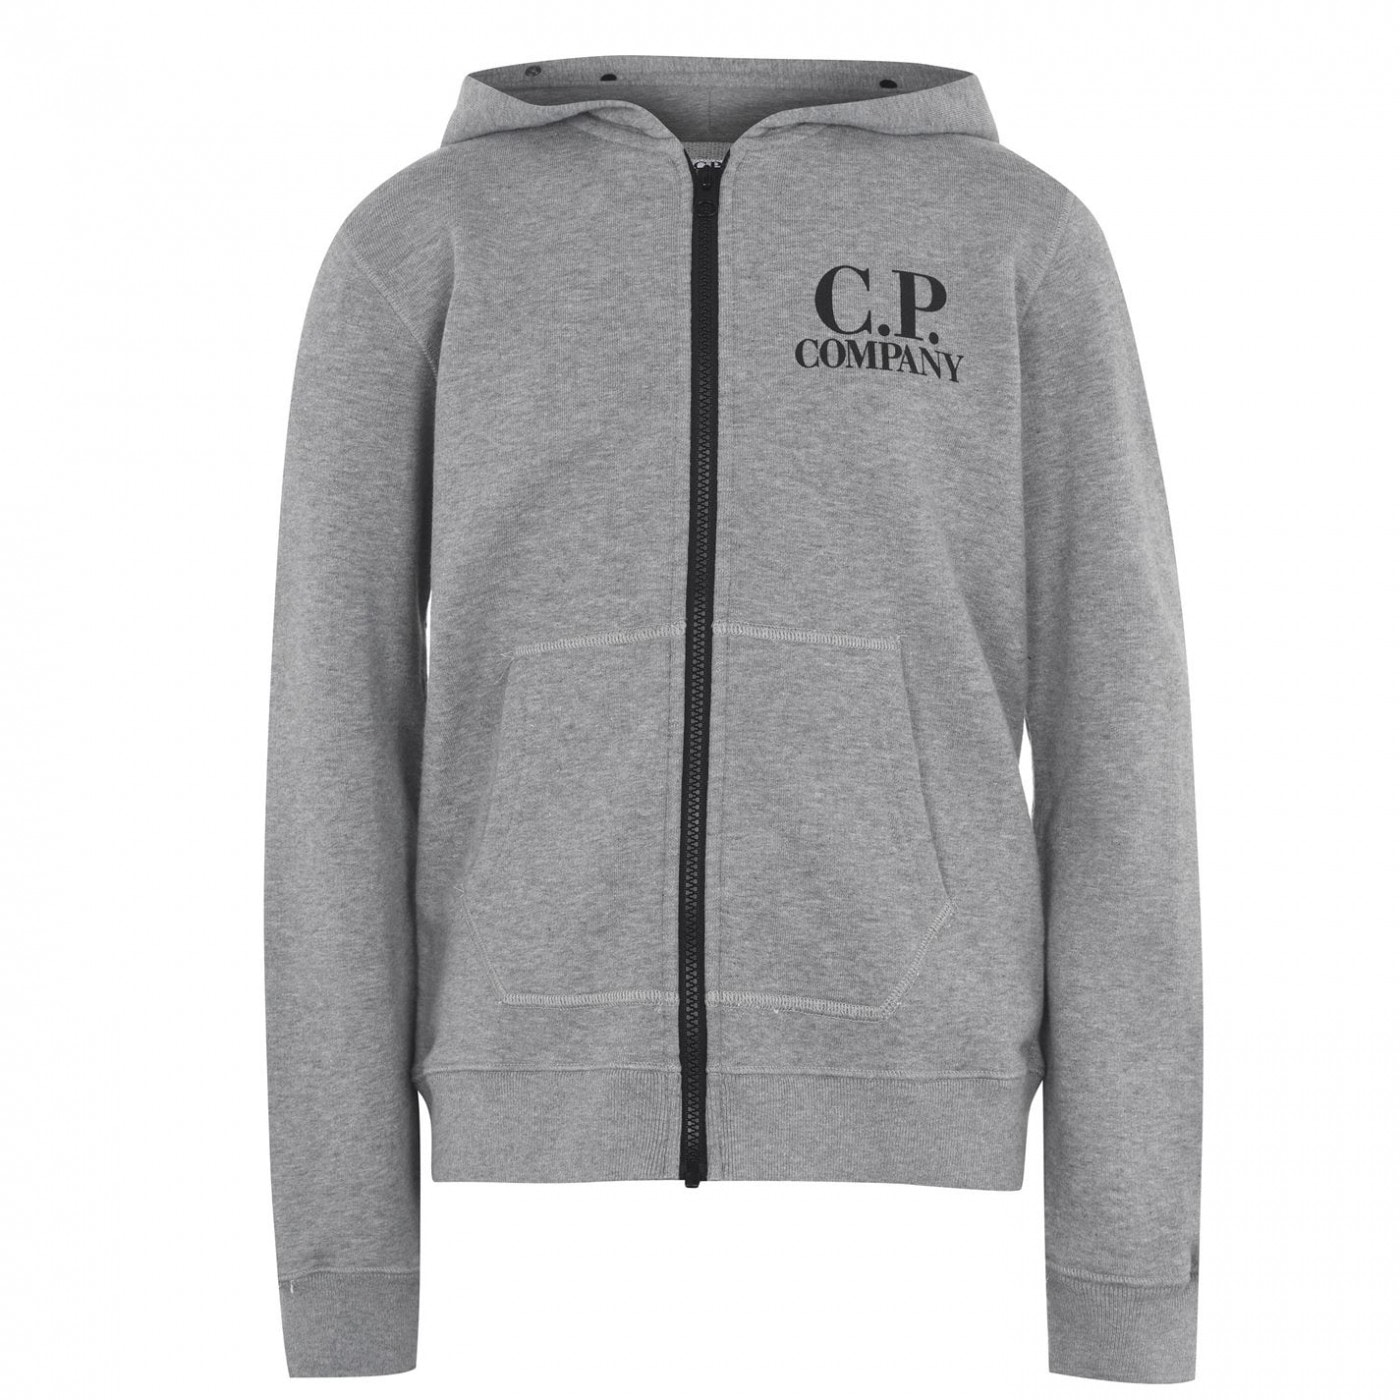 CP COMPANY Hooded Sweatshirt